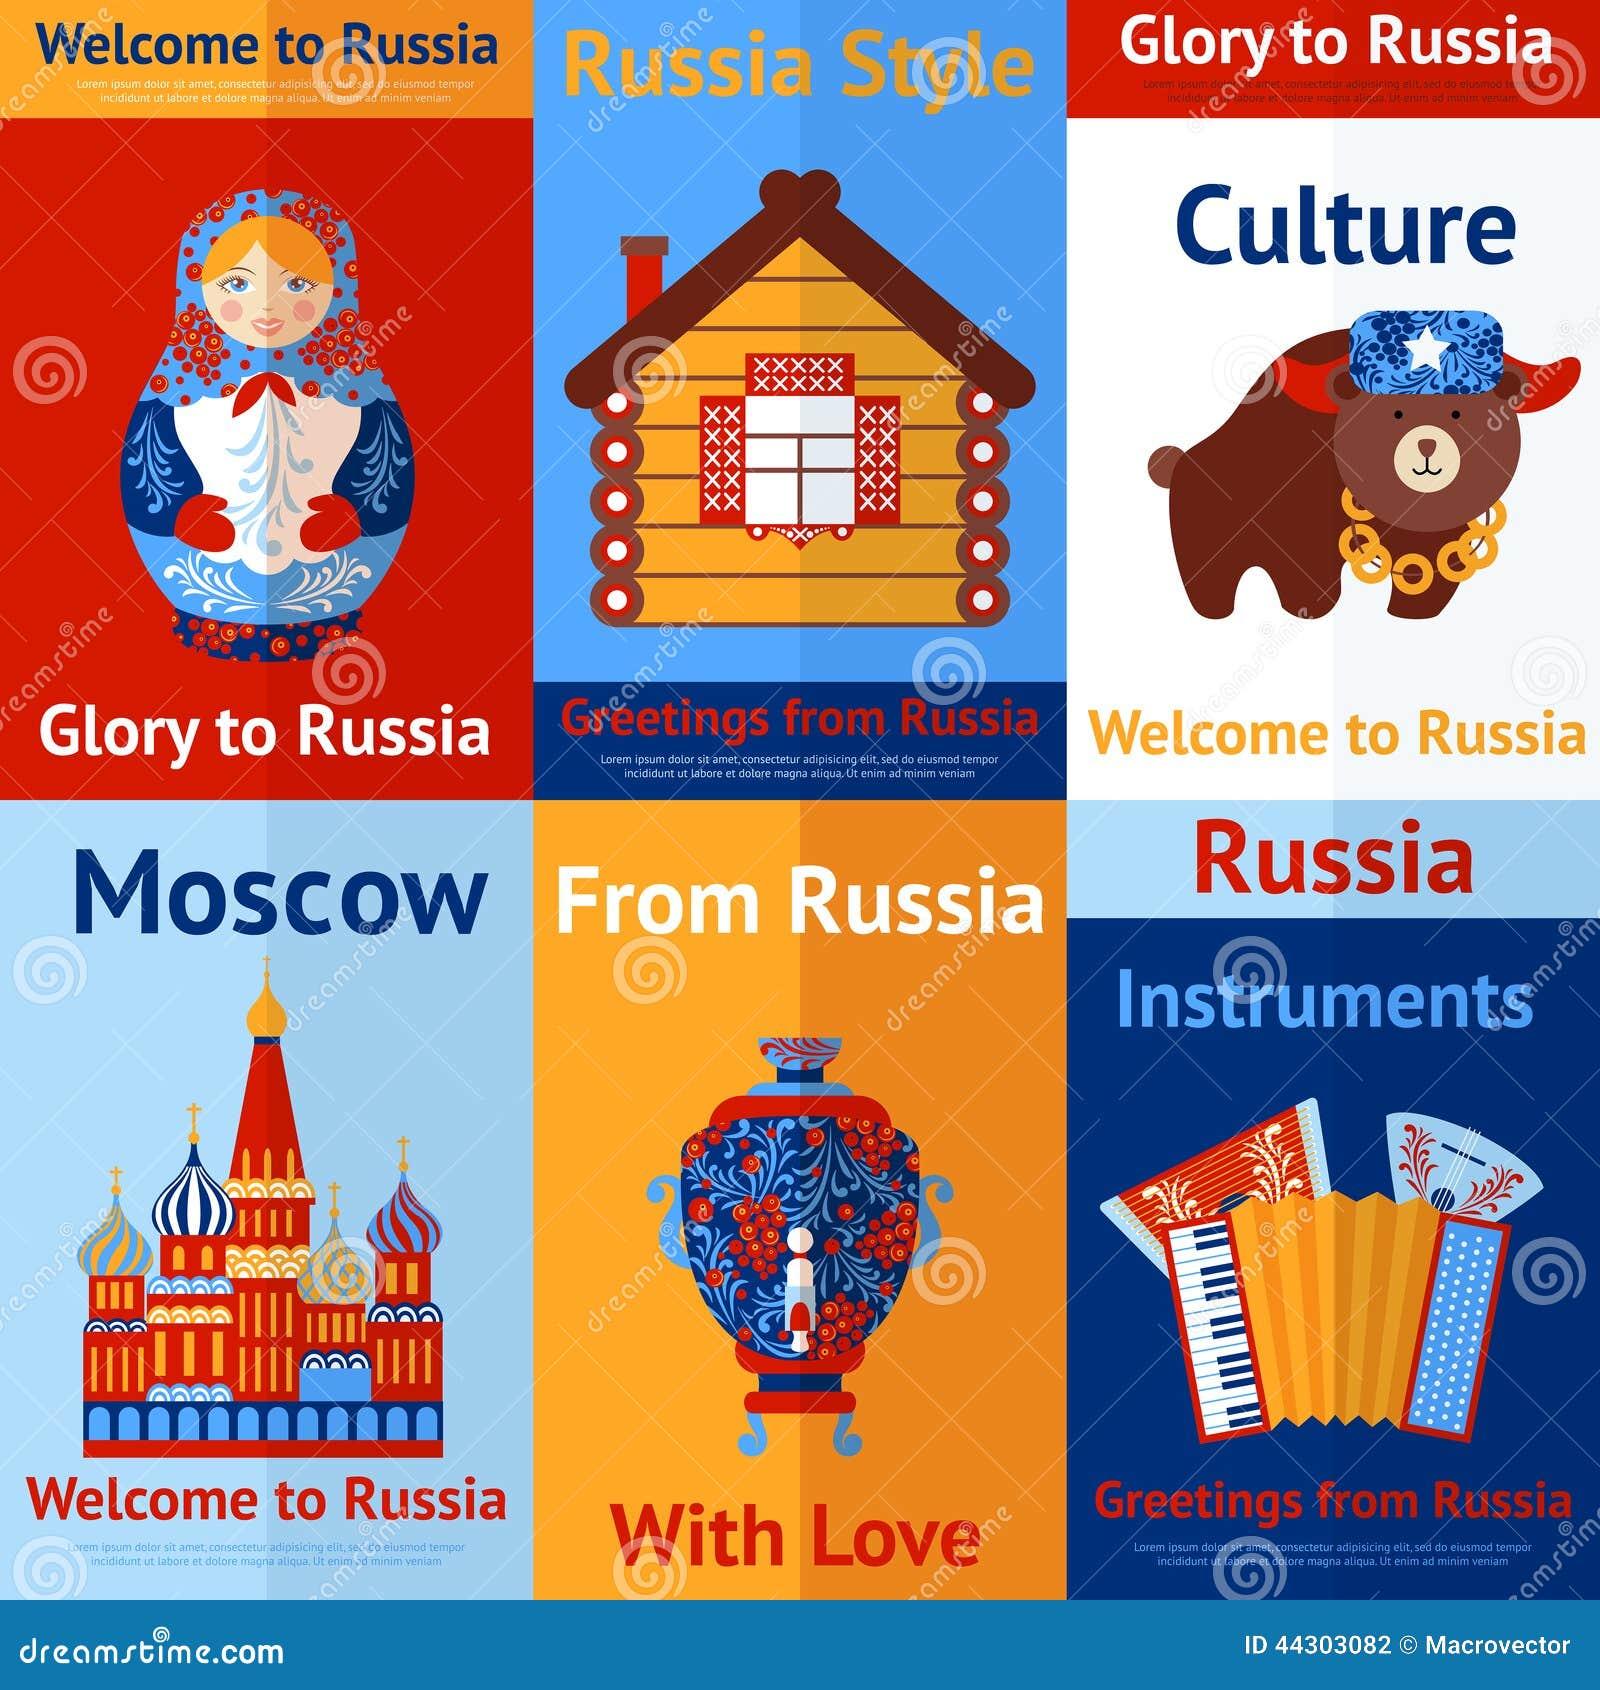 Russia Travel Retro Poster Stock Vector - Image: 44303082